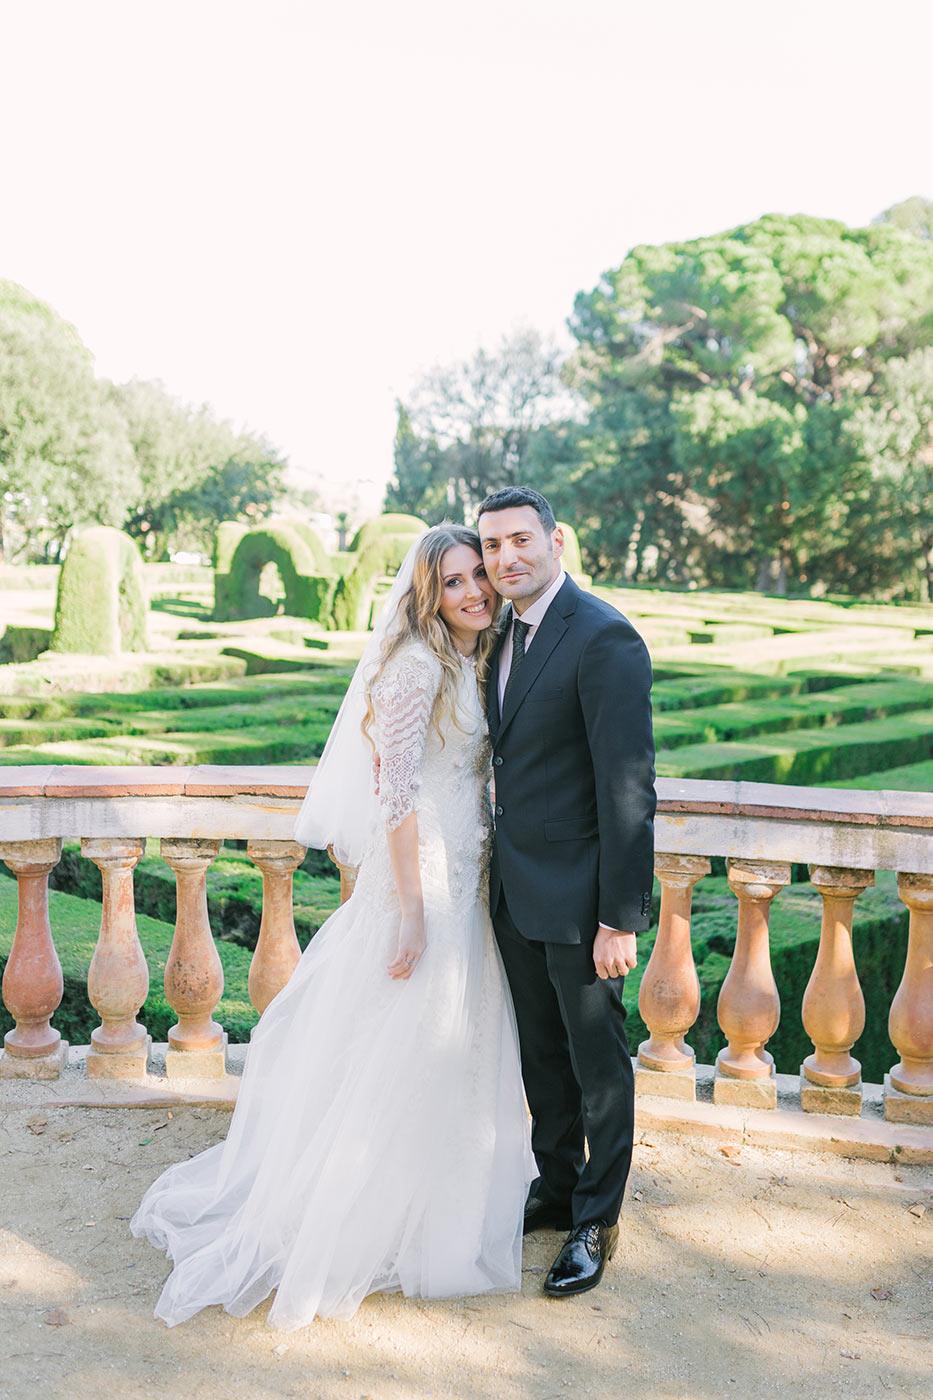 Lovely romantic couple | Fine Art Photographer | Lena Karelova Photography | Destination Wedding Photographer Barcelona | Film Wedding Photographer